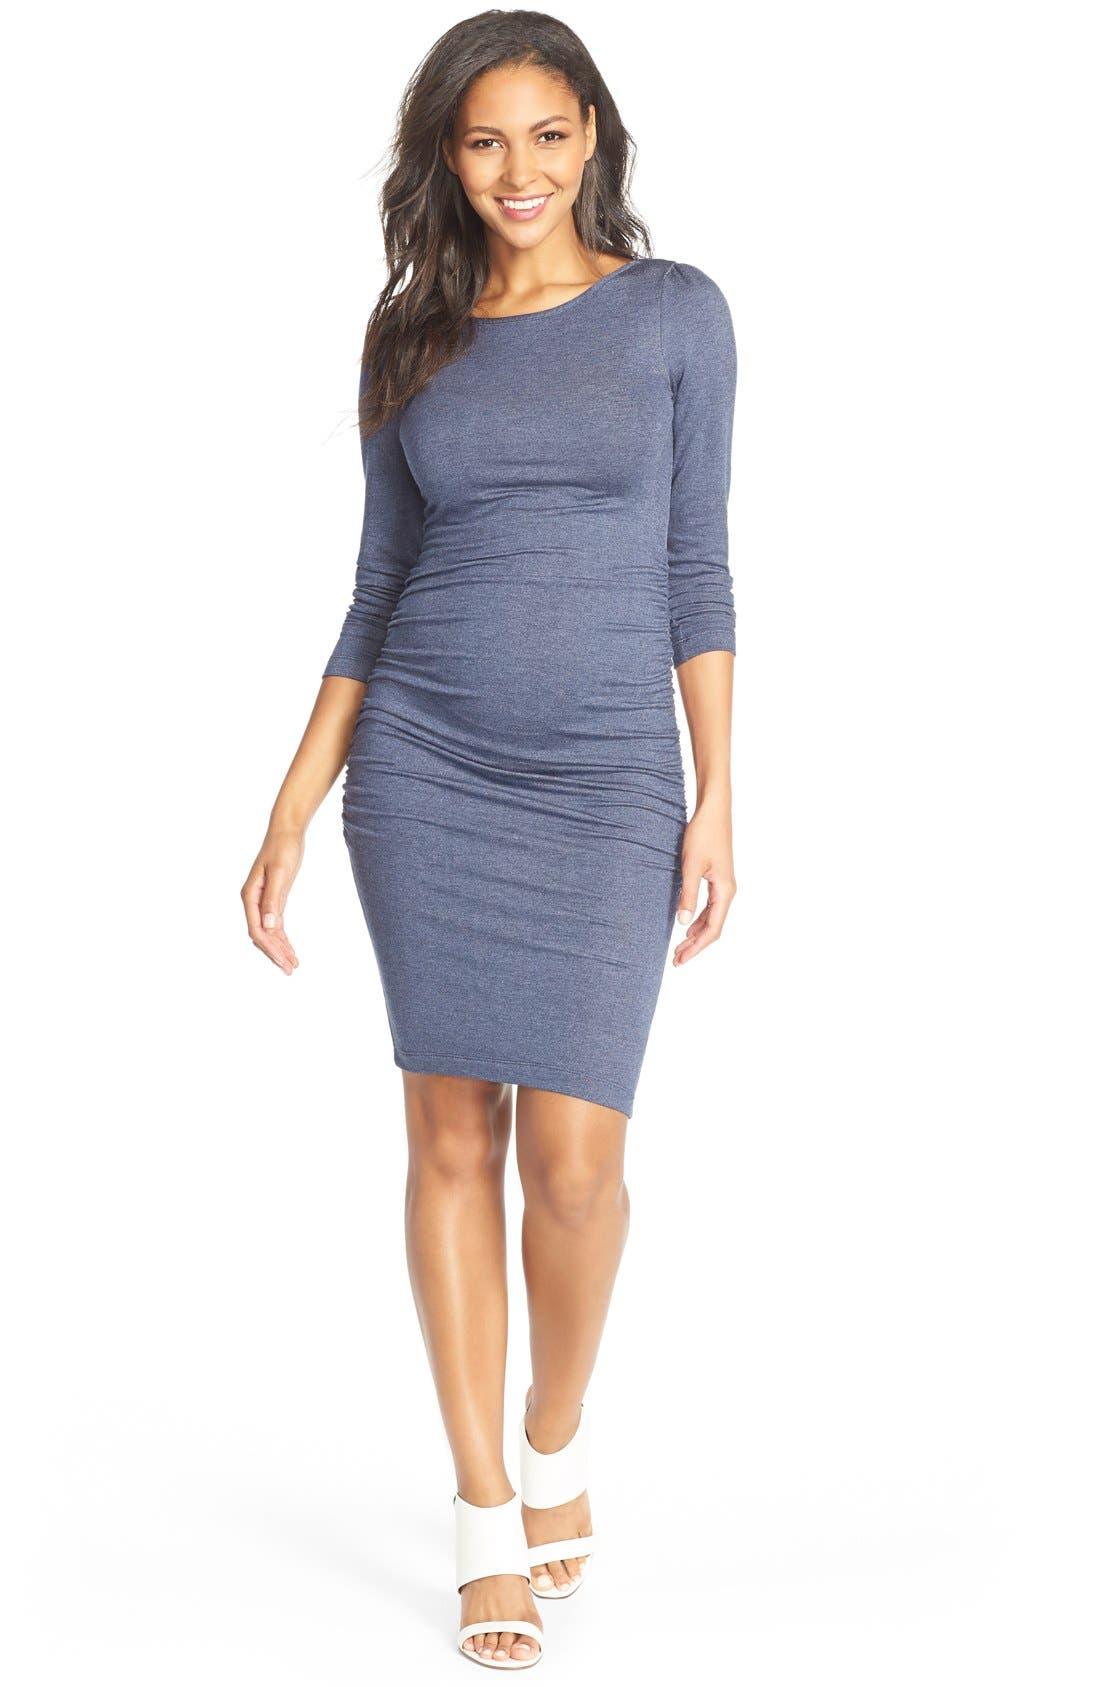 Presley Body-Con Maternity Dress,                             Main thumbnail 1, color,                             Blue Denim